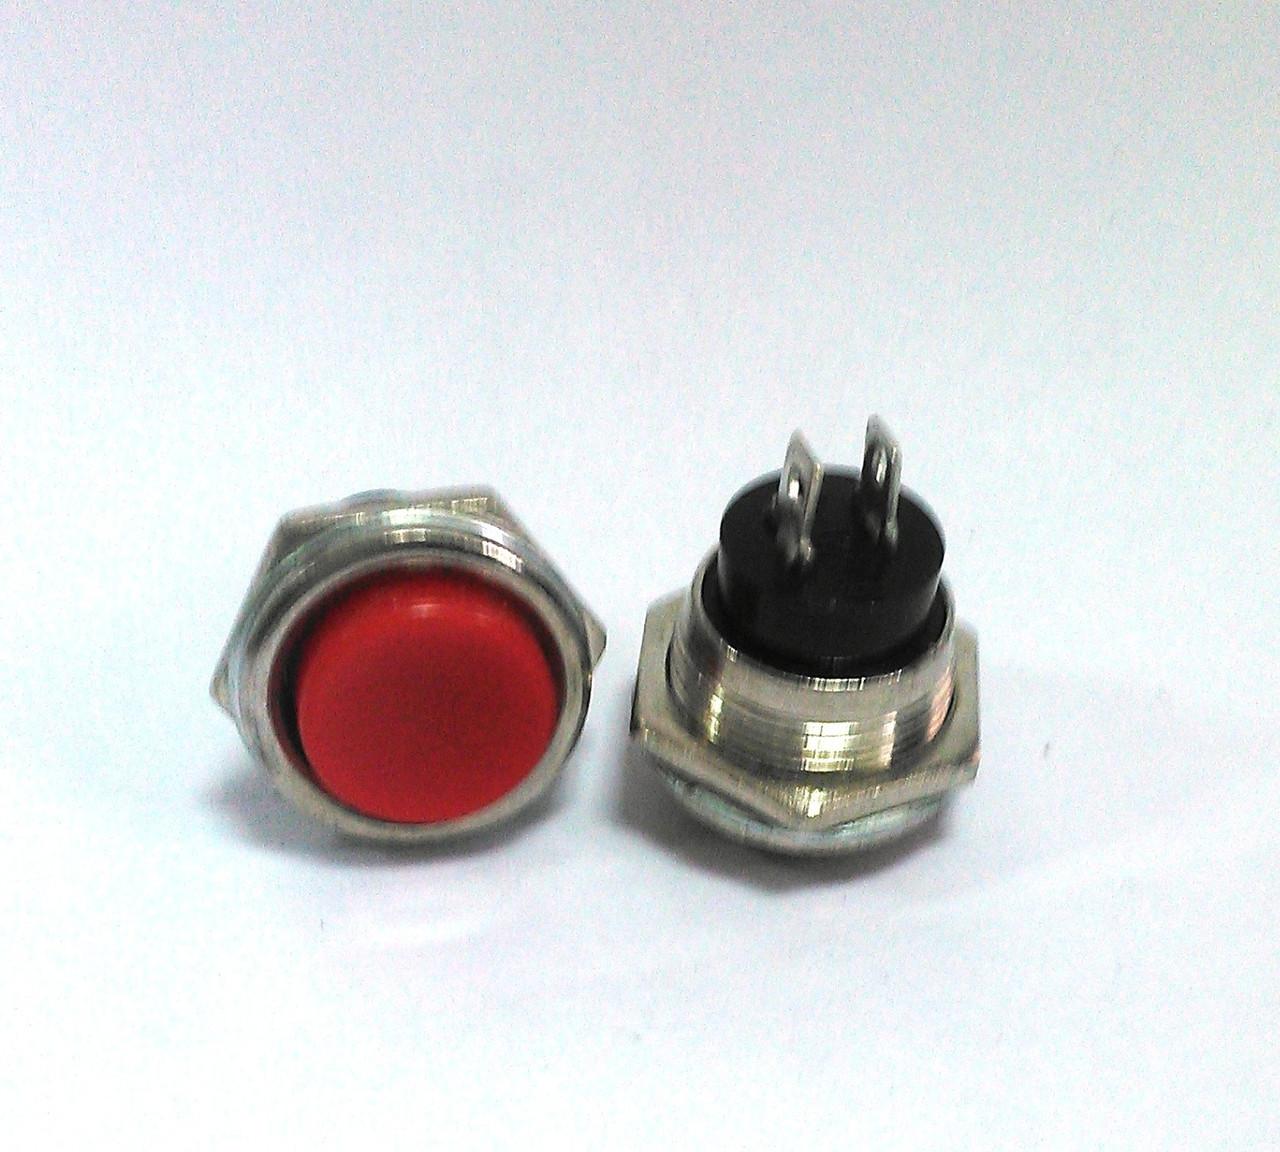 Кнопка пусковая PBS-26B без фиксации OFF-(ON), 2pin, 2А 250V RED